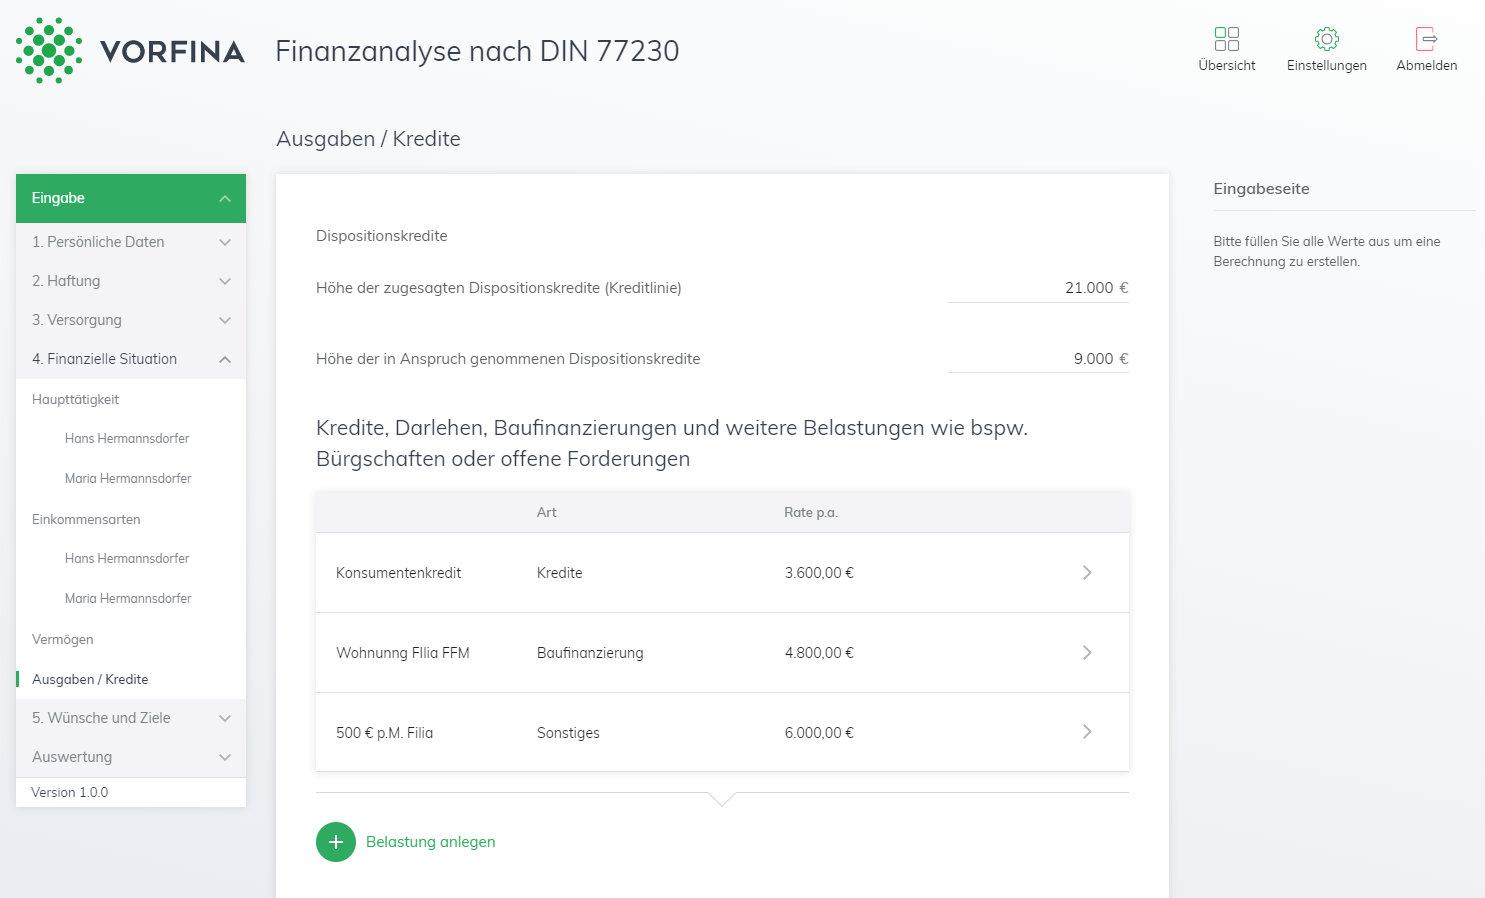 https://www.vorfina.de/wp-content/uploads/2019/06/Kachel_Ausgaben_Kredite@2x.jpg